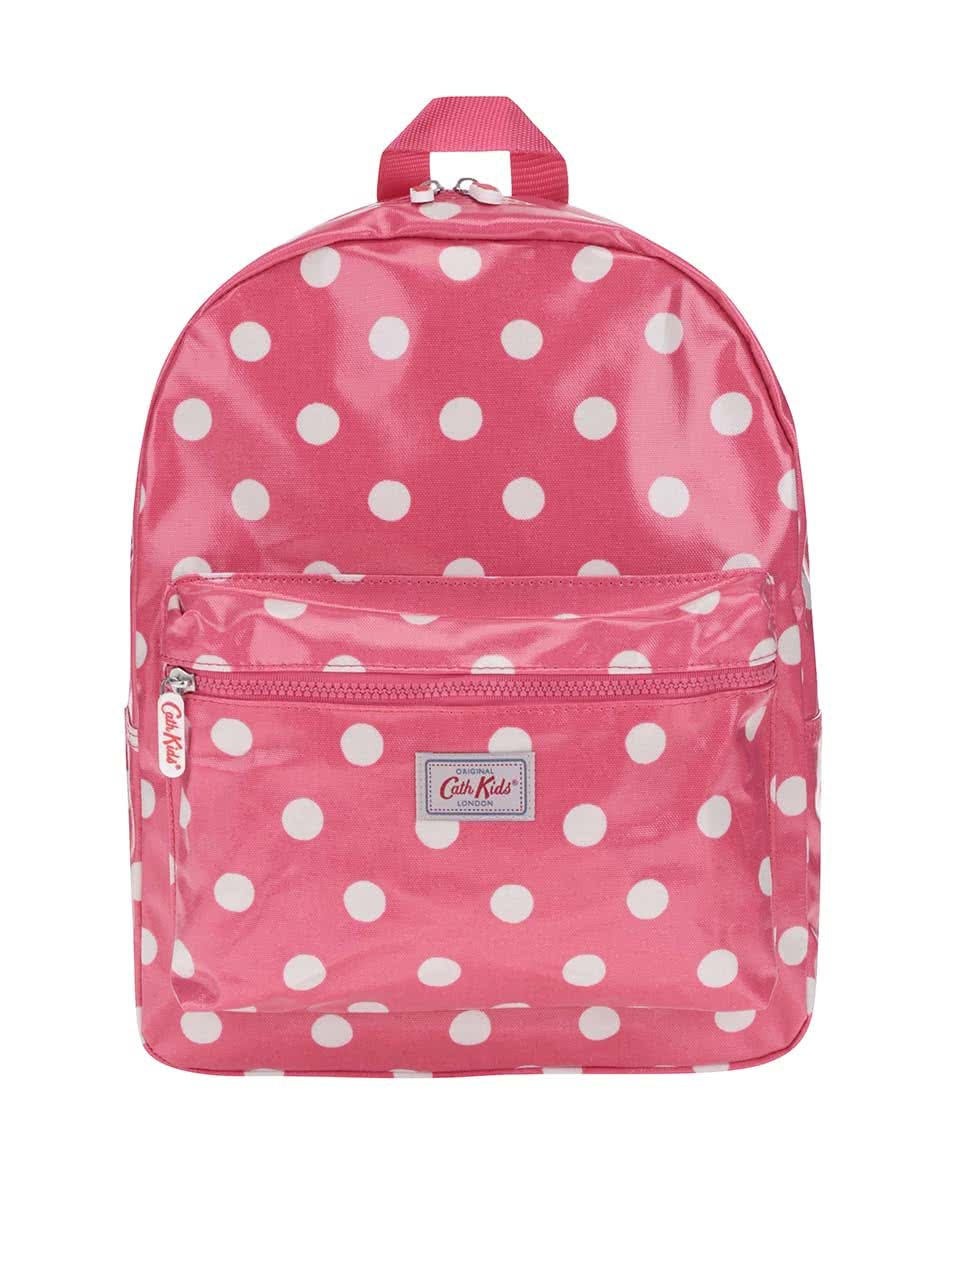 Růžový dívčí batoh s bílými puntíky Cath Kidston ... a773ba82c2